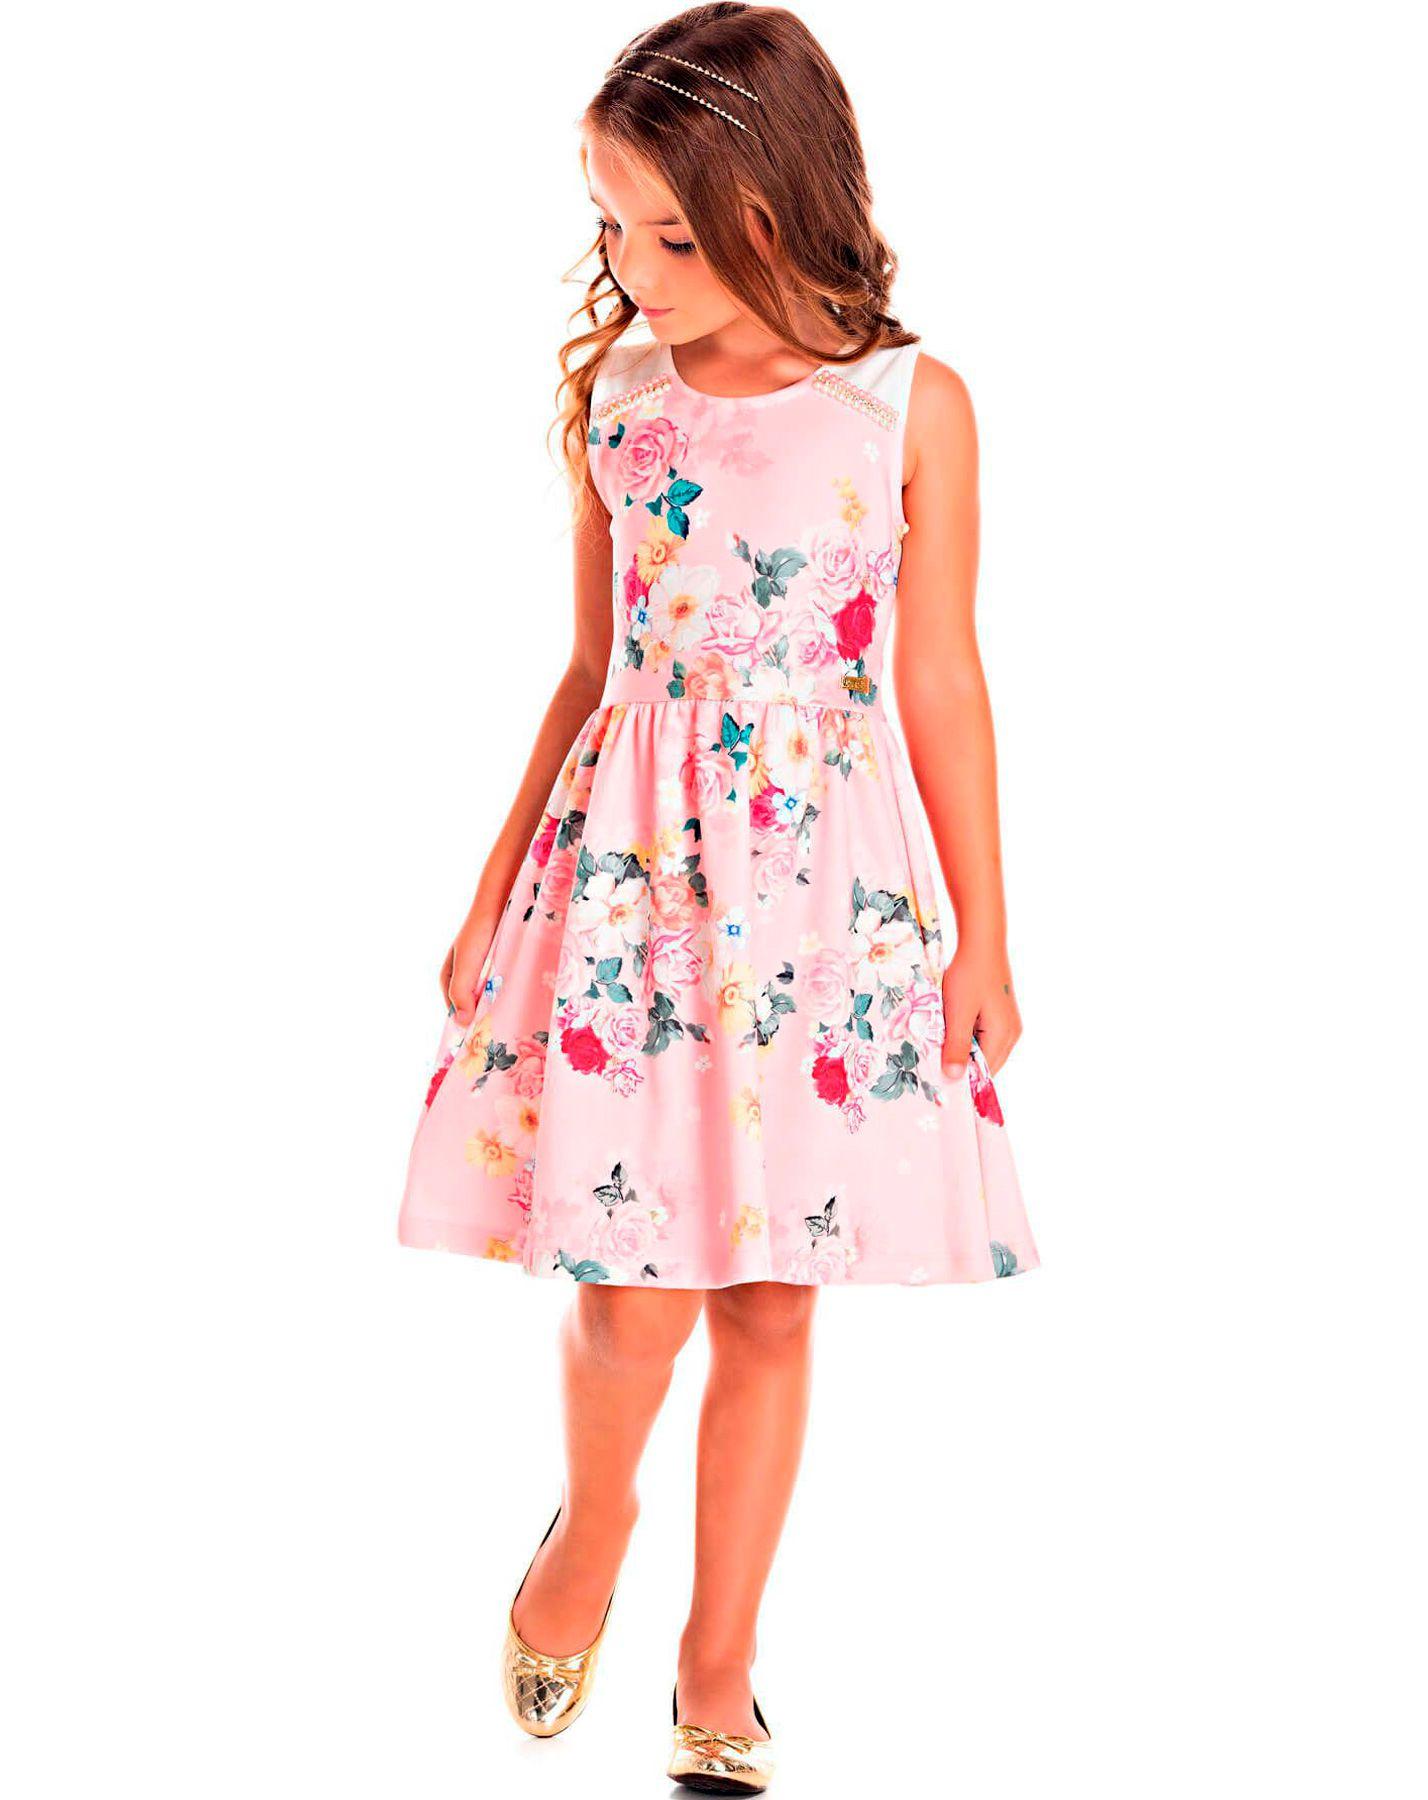 Vestido Pic Nic em Jacquard Floral